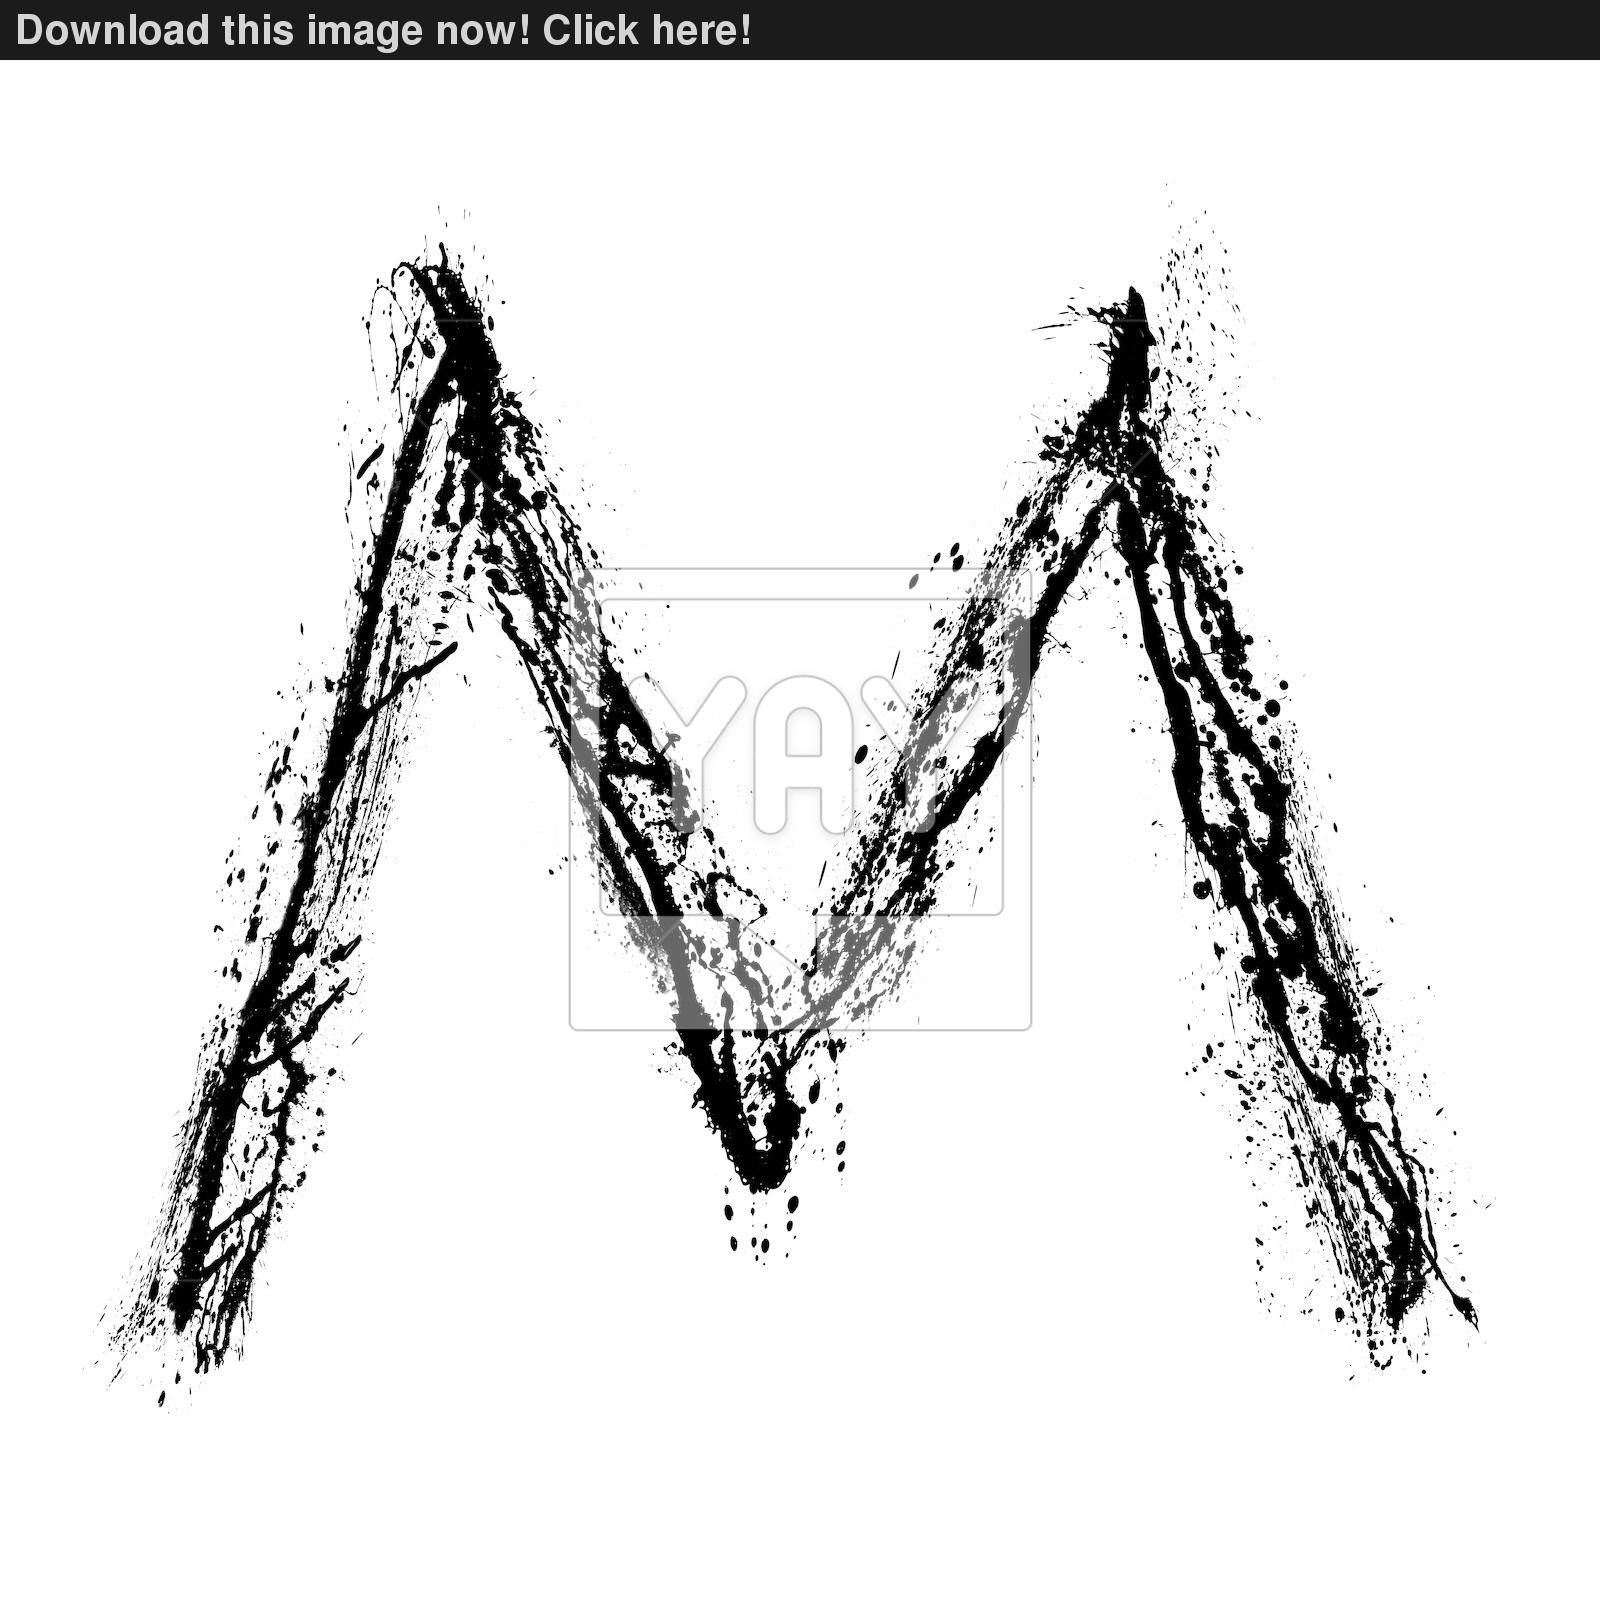 1600x1600 Alphabet Splash Draw Image